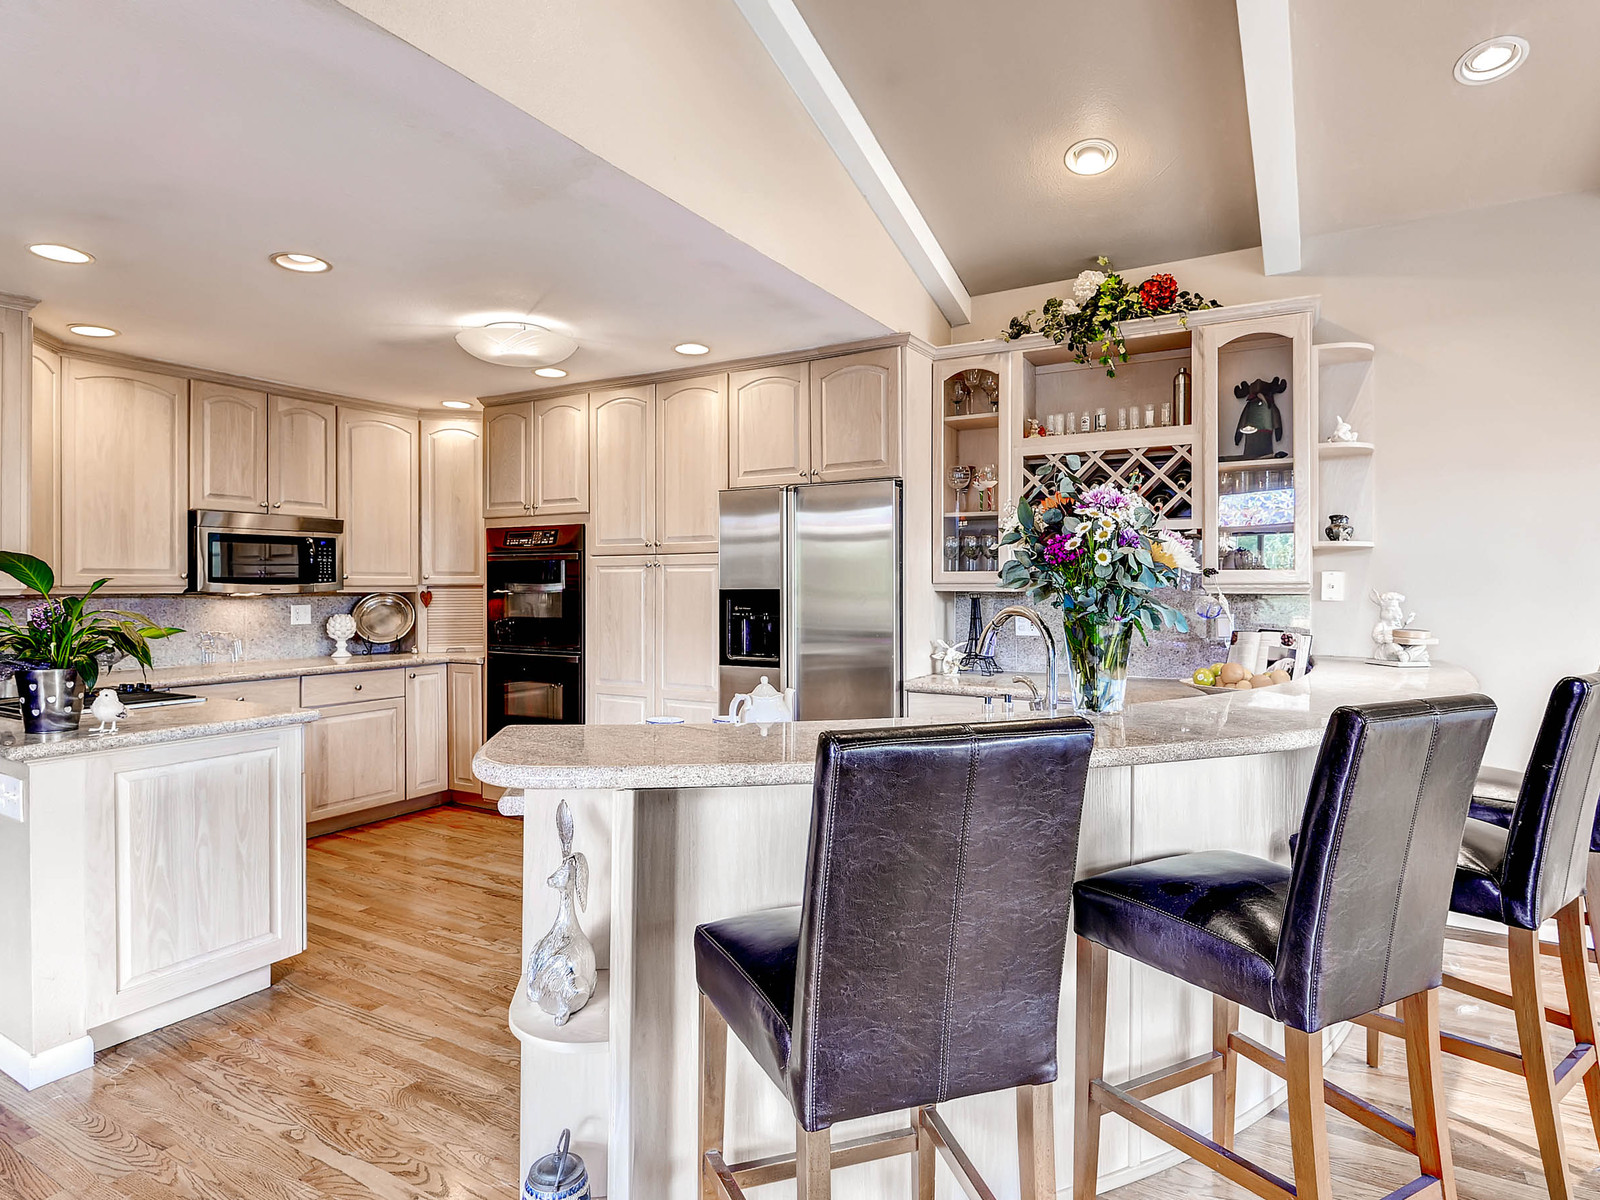 852 E Briarwood Circle S-MLS_Size-008-Kitchen-1600x1200-72dpi.jpg